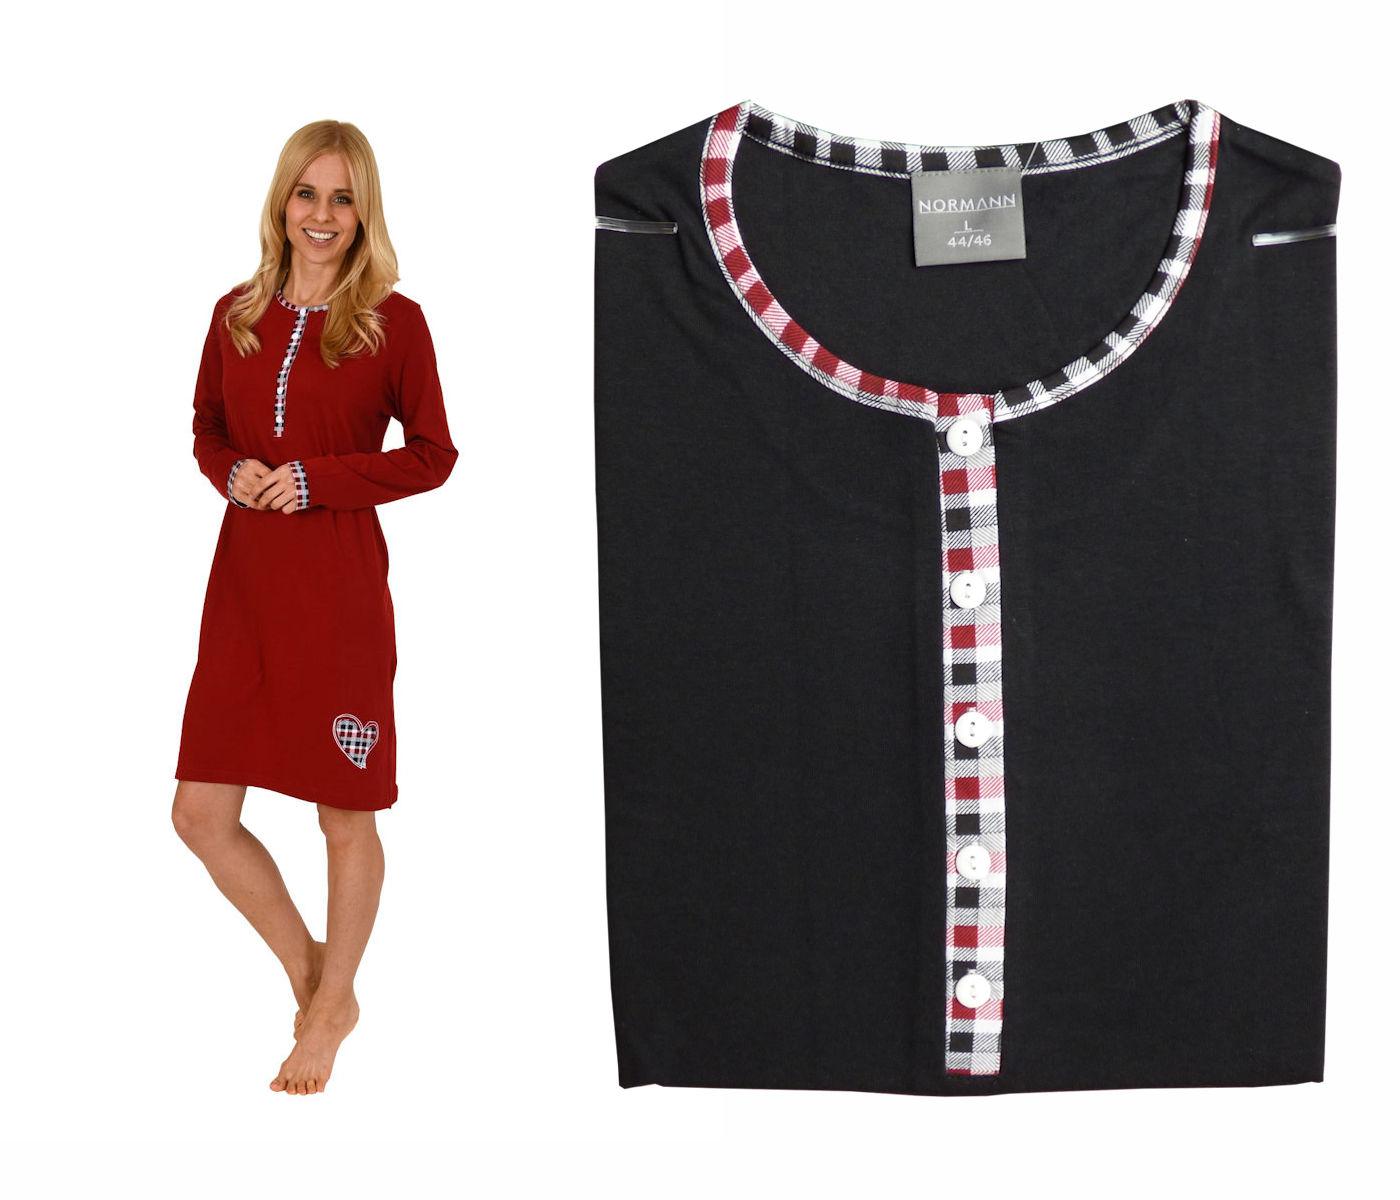 finest selection 3f83a 69f21 Damen Kurznachthemd mit Knopfleiste Langarm Uni 57961